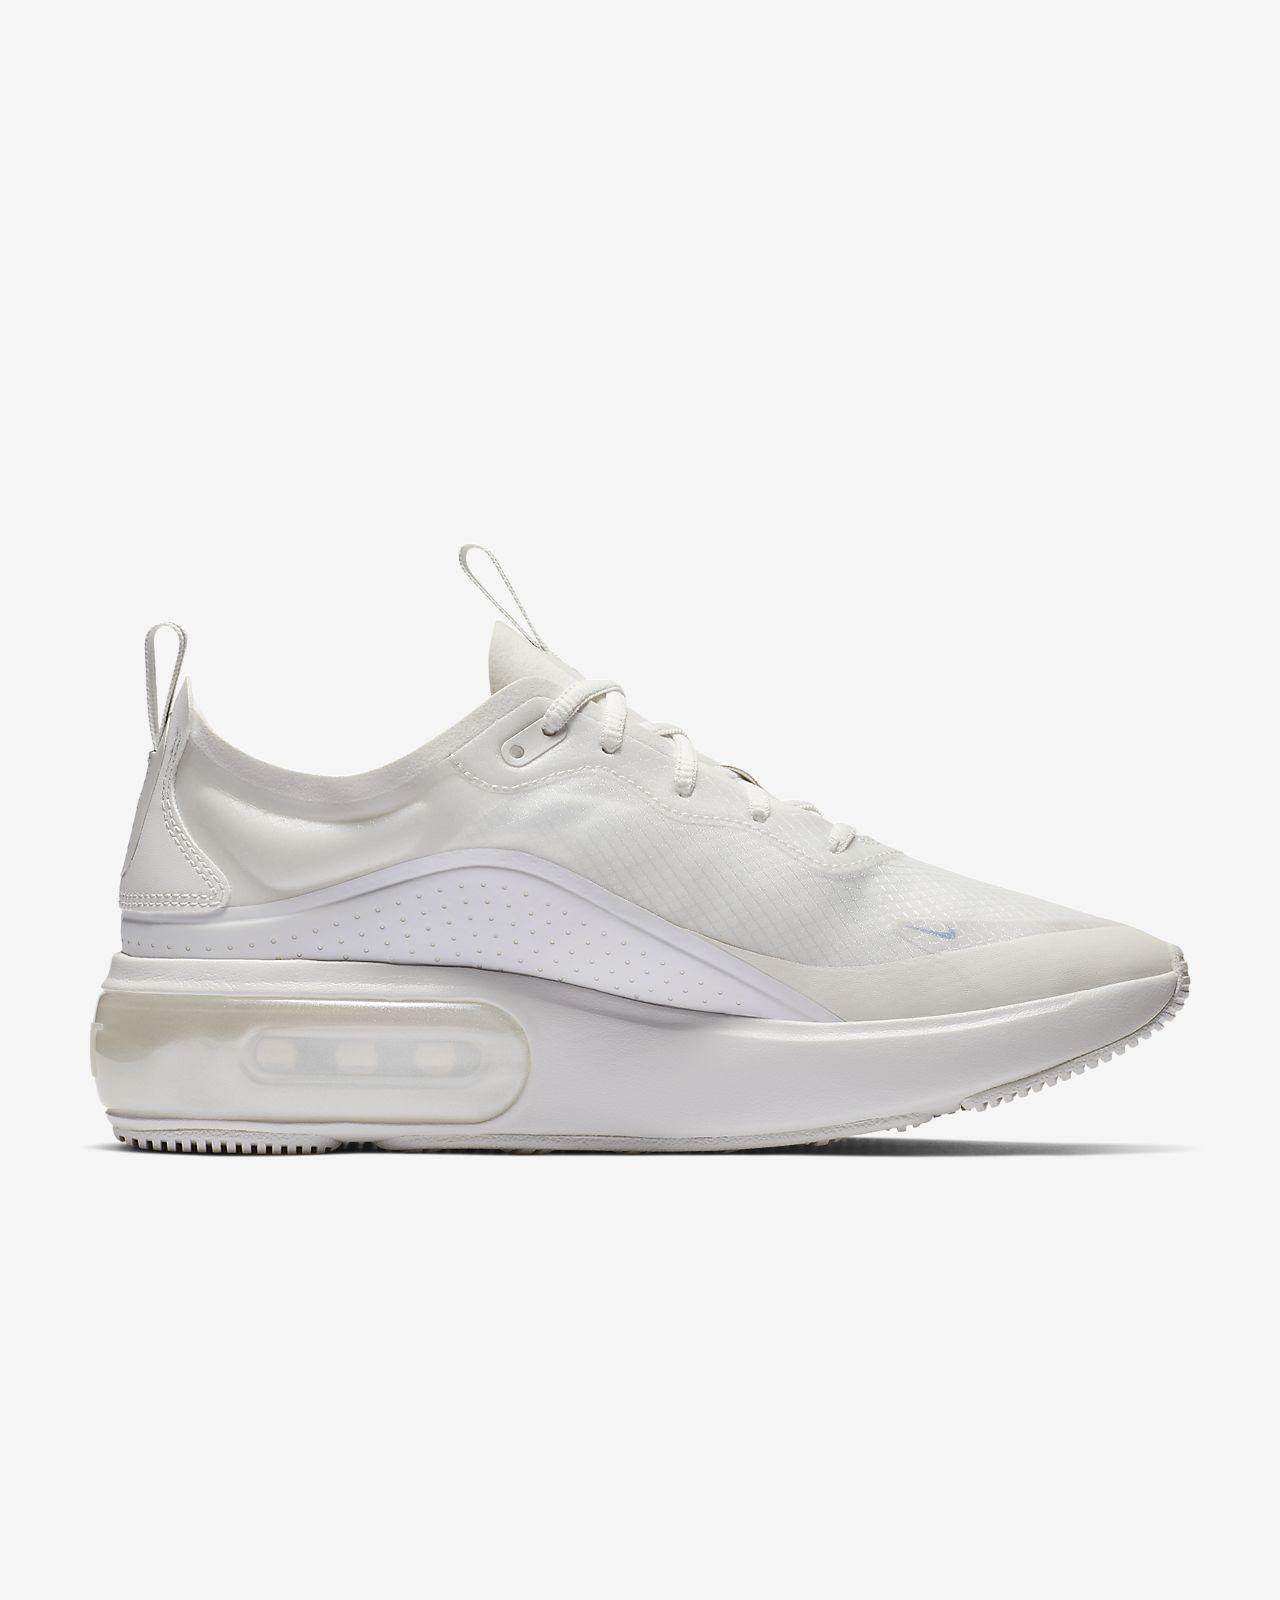 Nike Women's Air Max 90 Shoes Pale IvorySummit WhiteGrey